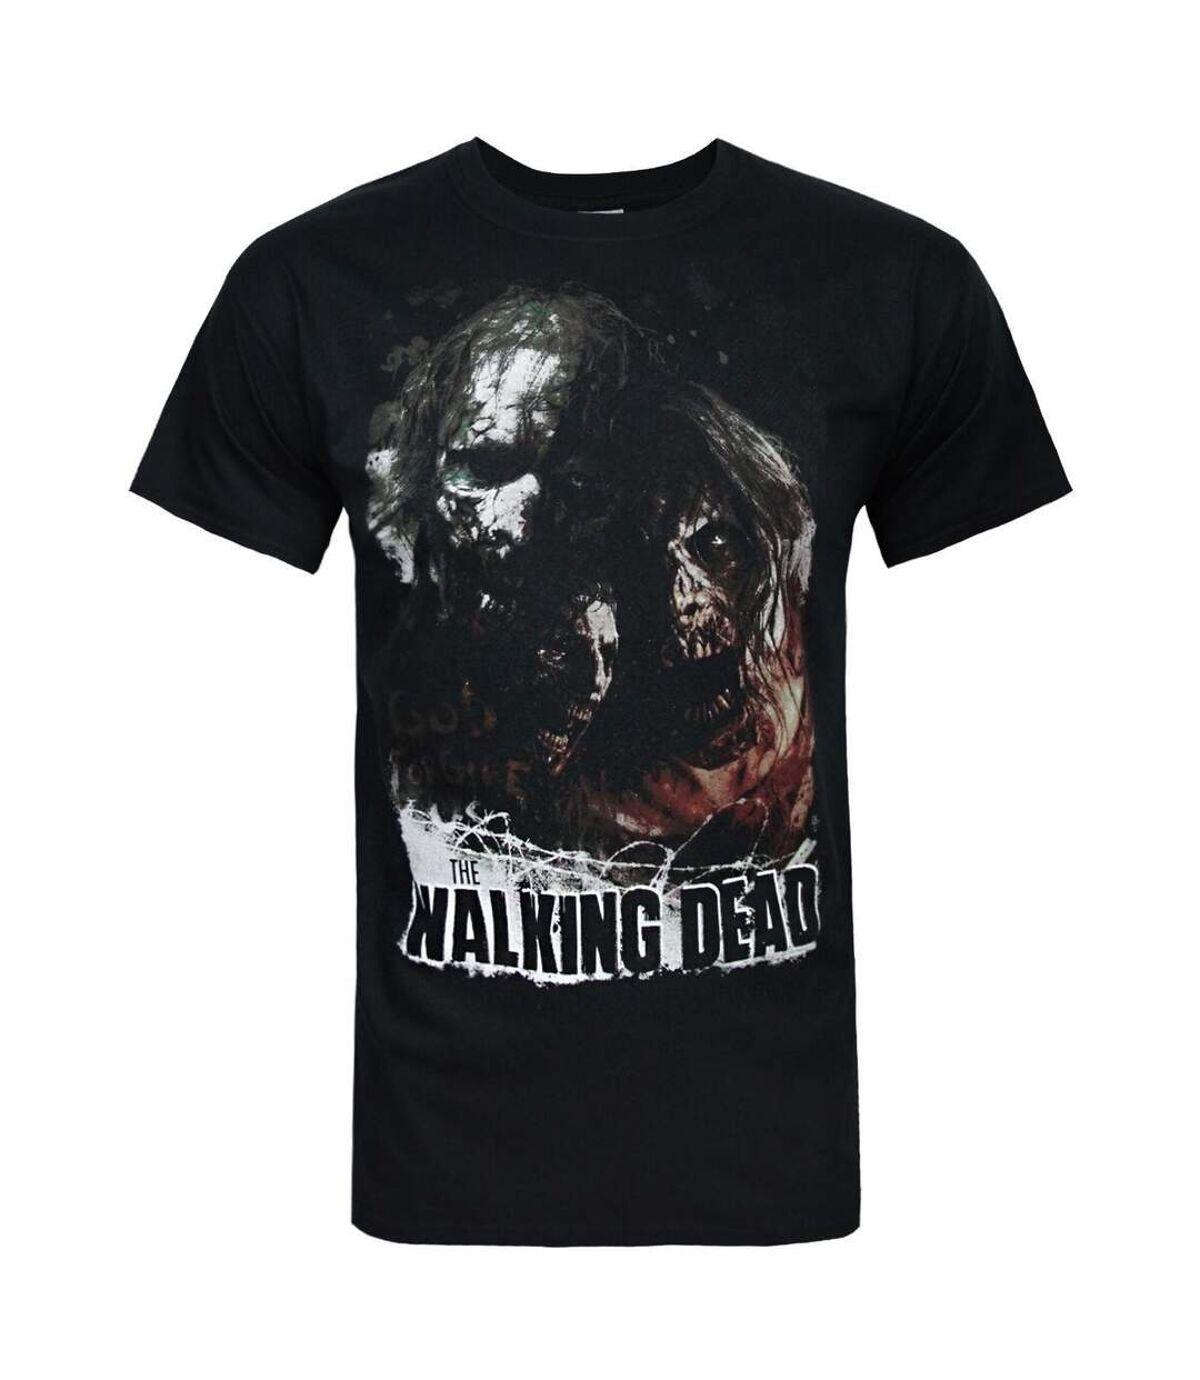 The Walking Dead Mens God Forgive Us T-Shirt (Black) - UTNS5584